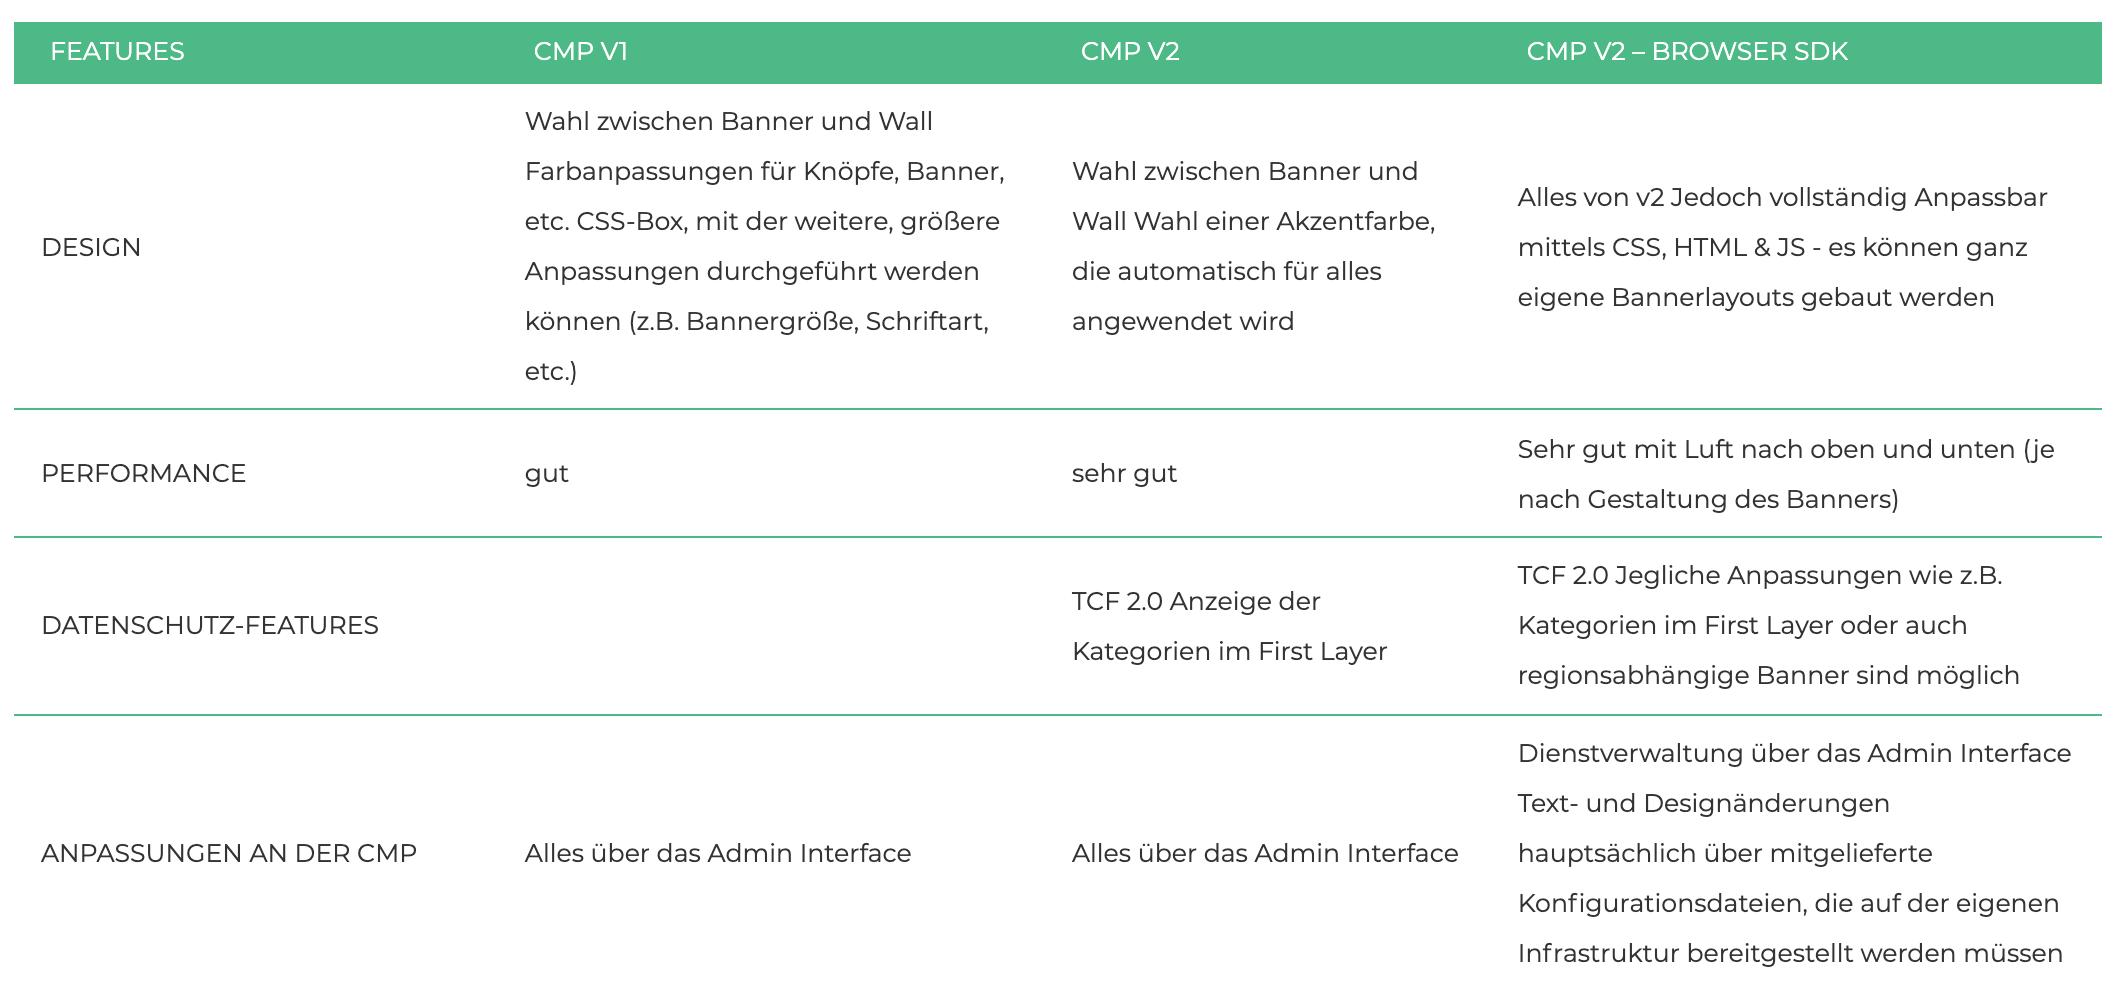 Usercentrics Browser DSK Vergleich Tabelle